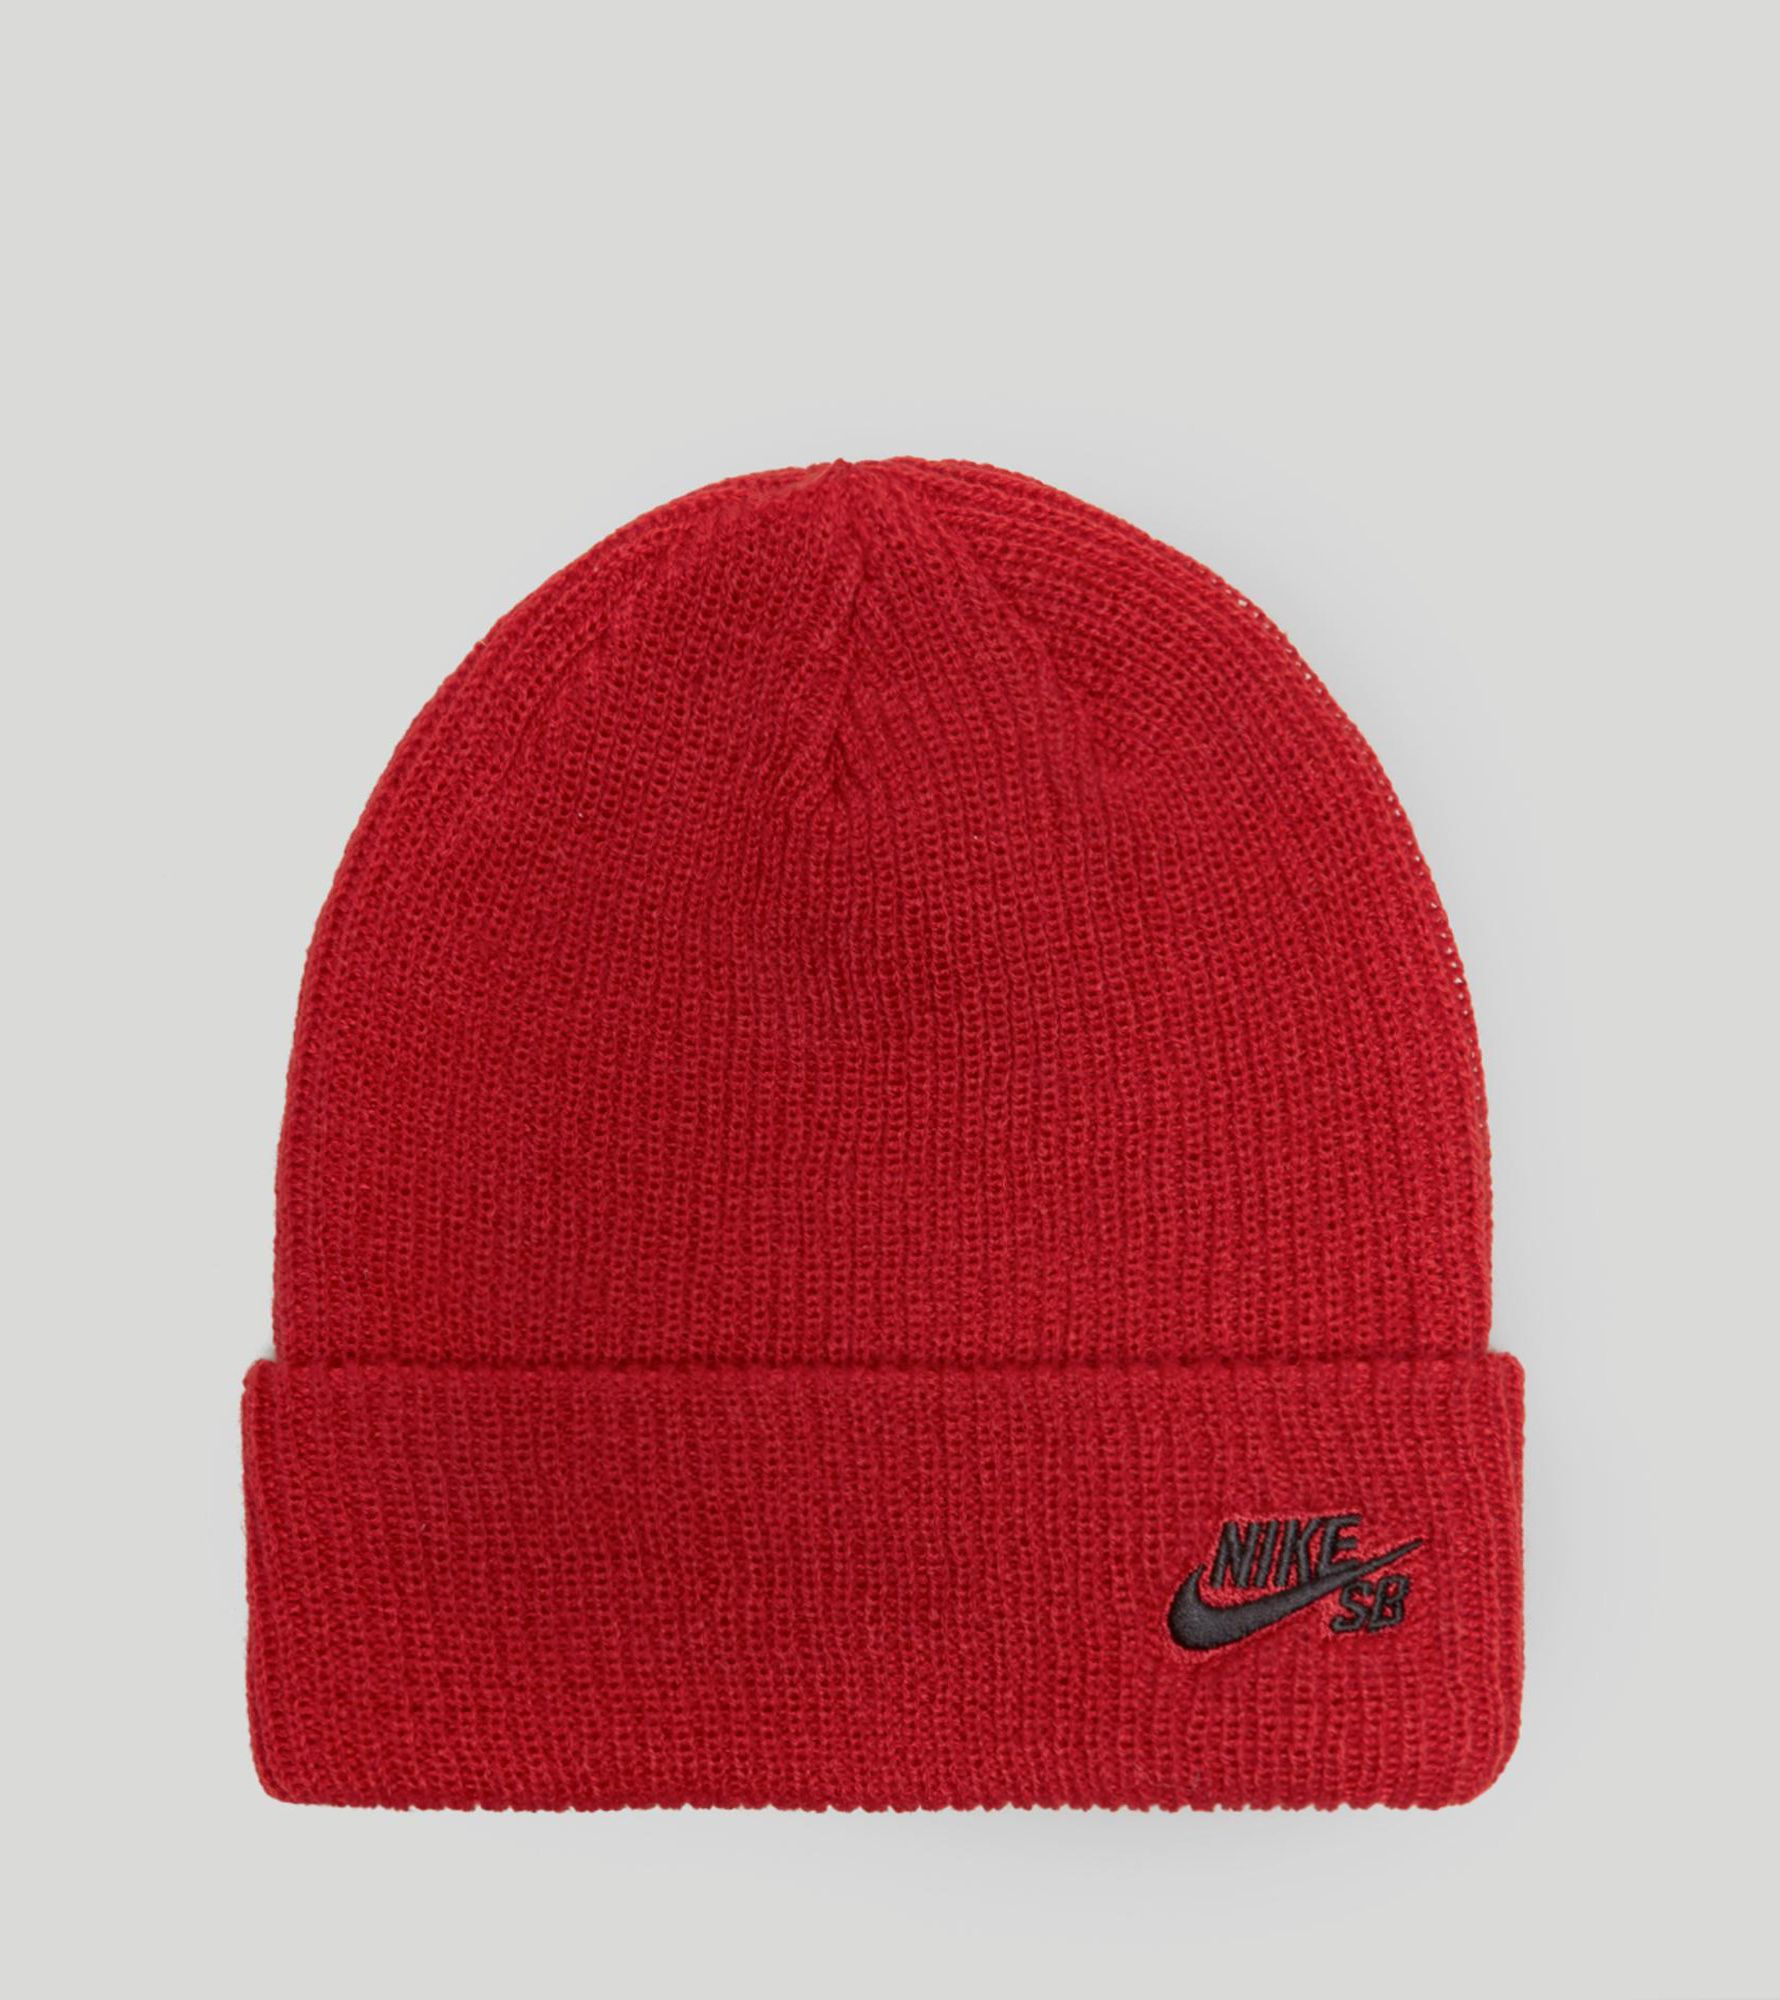 00966b78c02b6 Nike SB Fisherman Beanie Hat